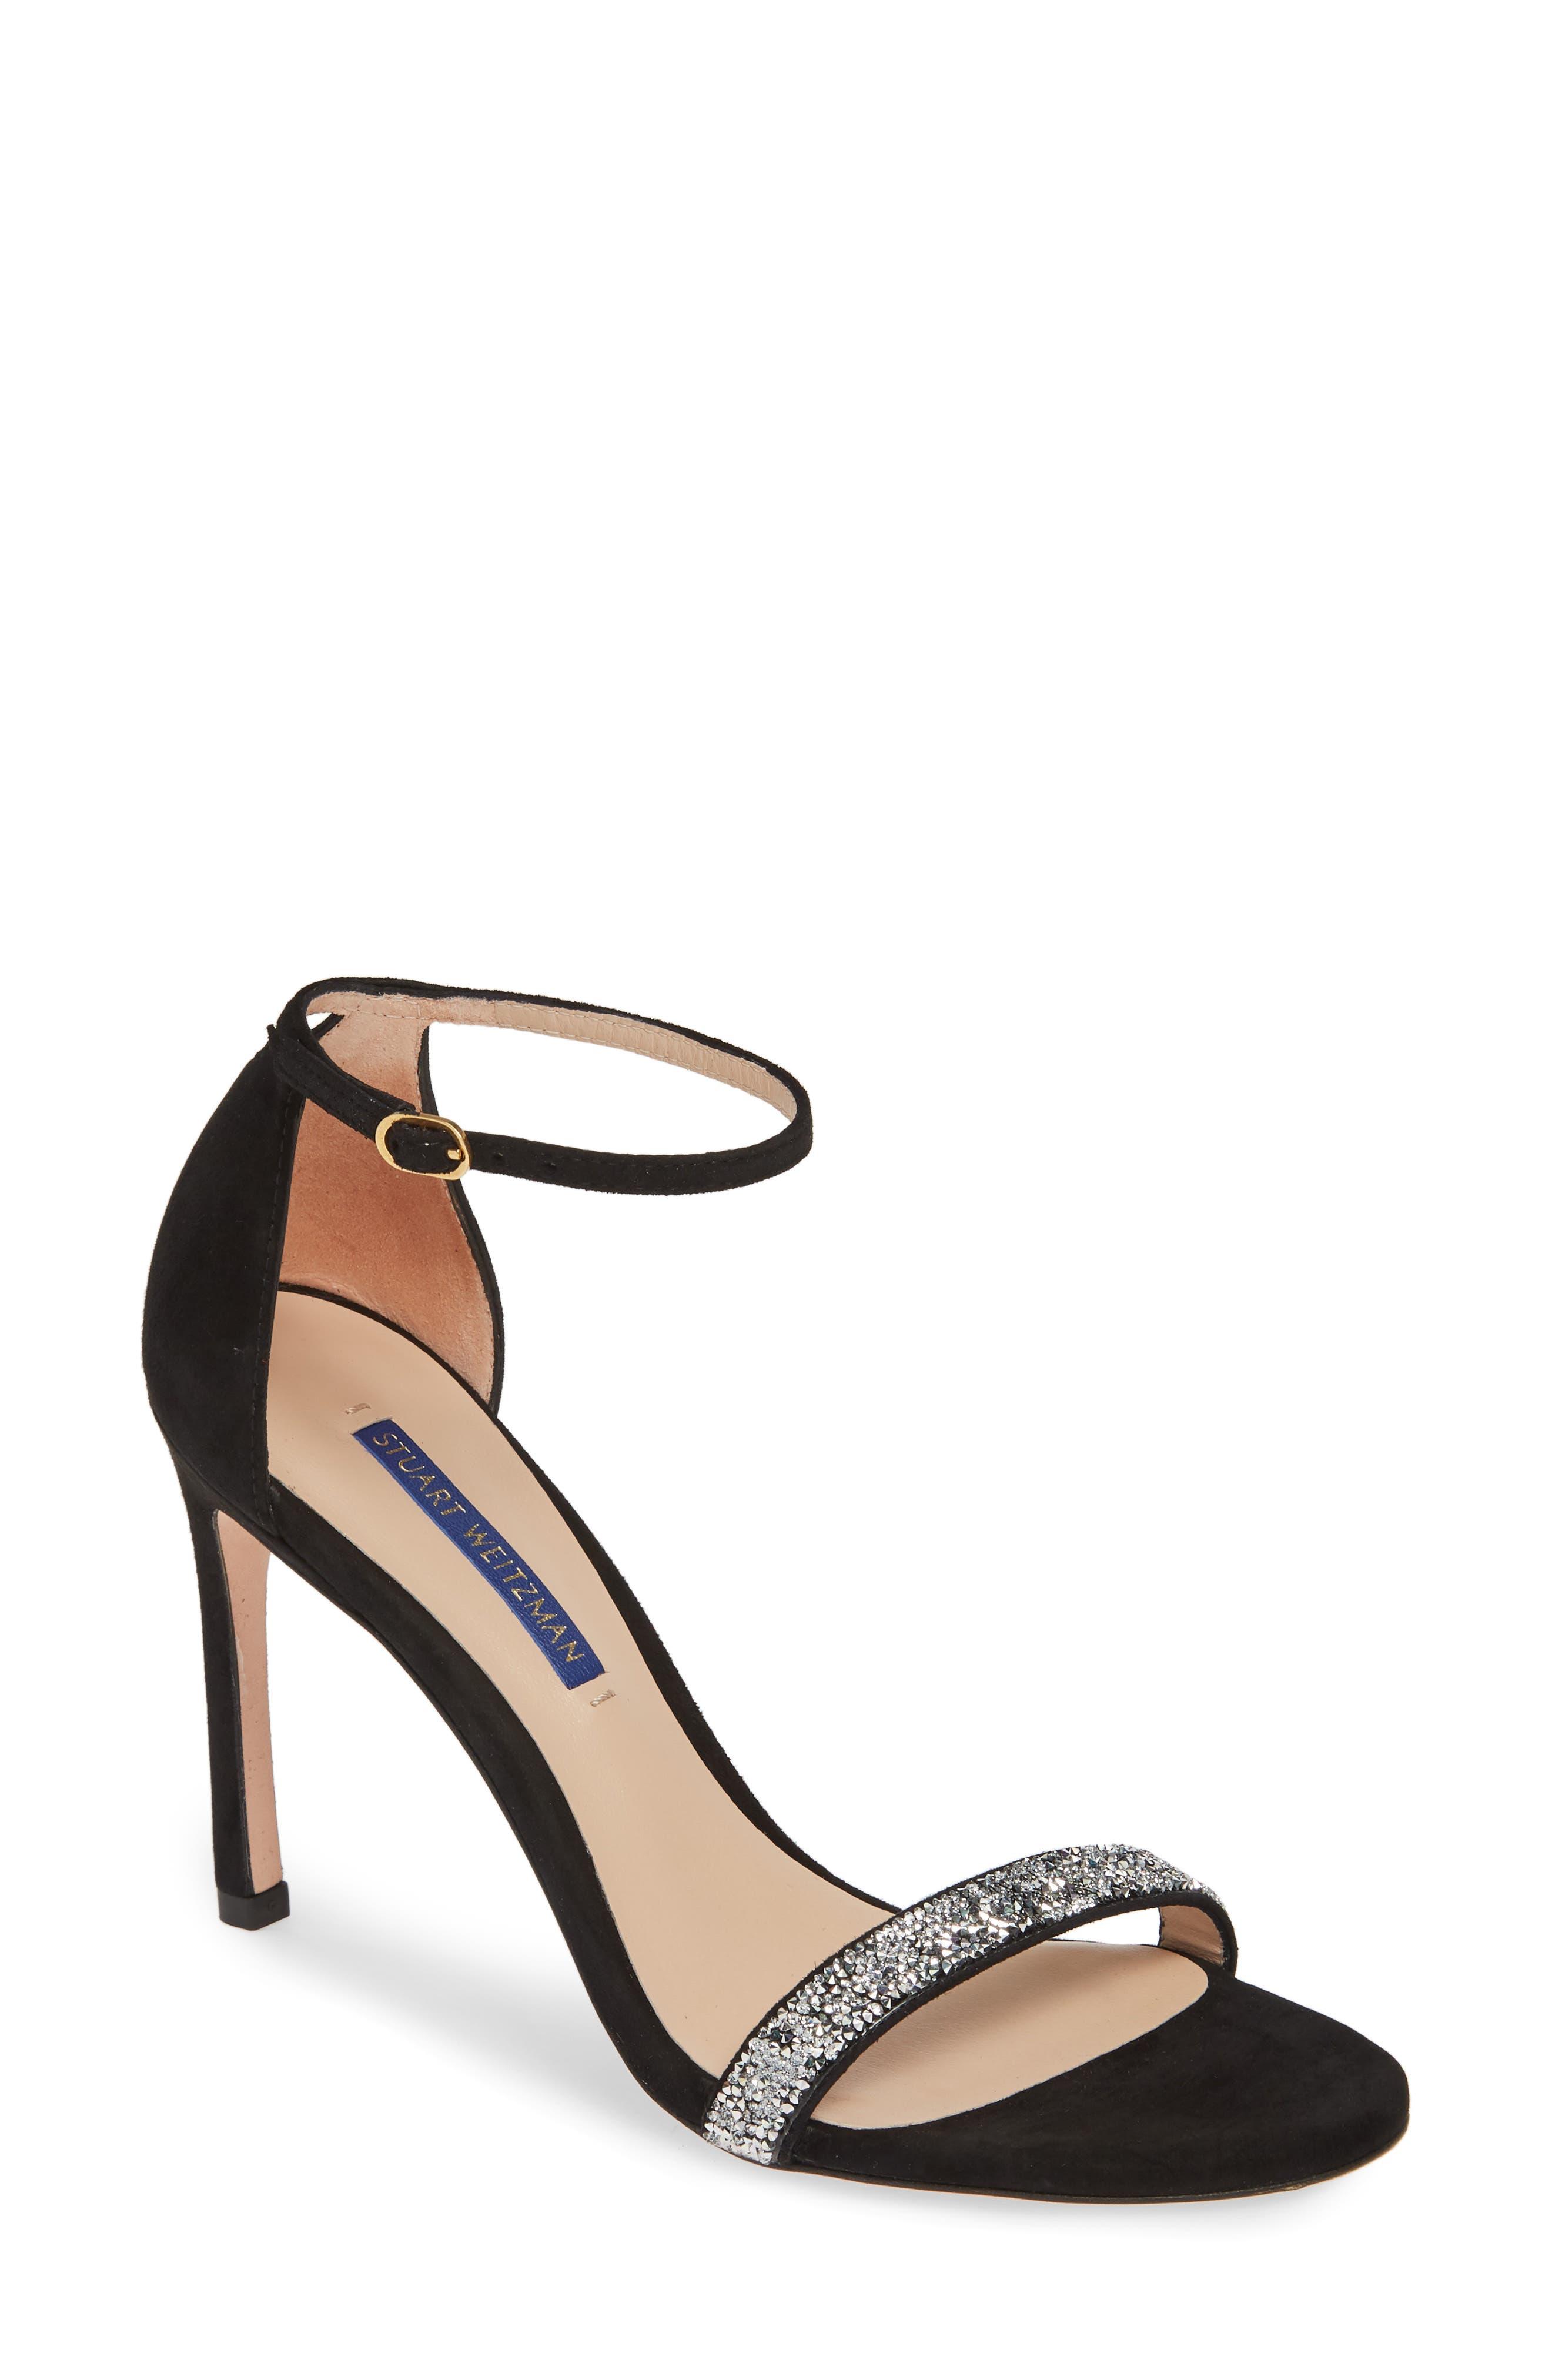 STUART WEITZMAN,                             Nudistsong Ankle Strap Sandal,                             Main thumbnail 1, color,                             BLACK